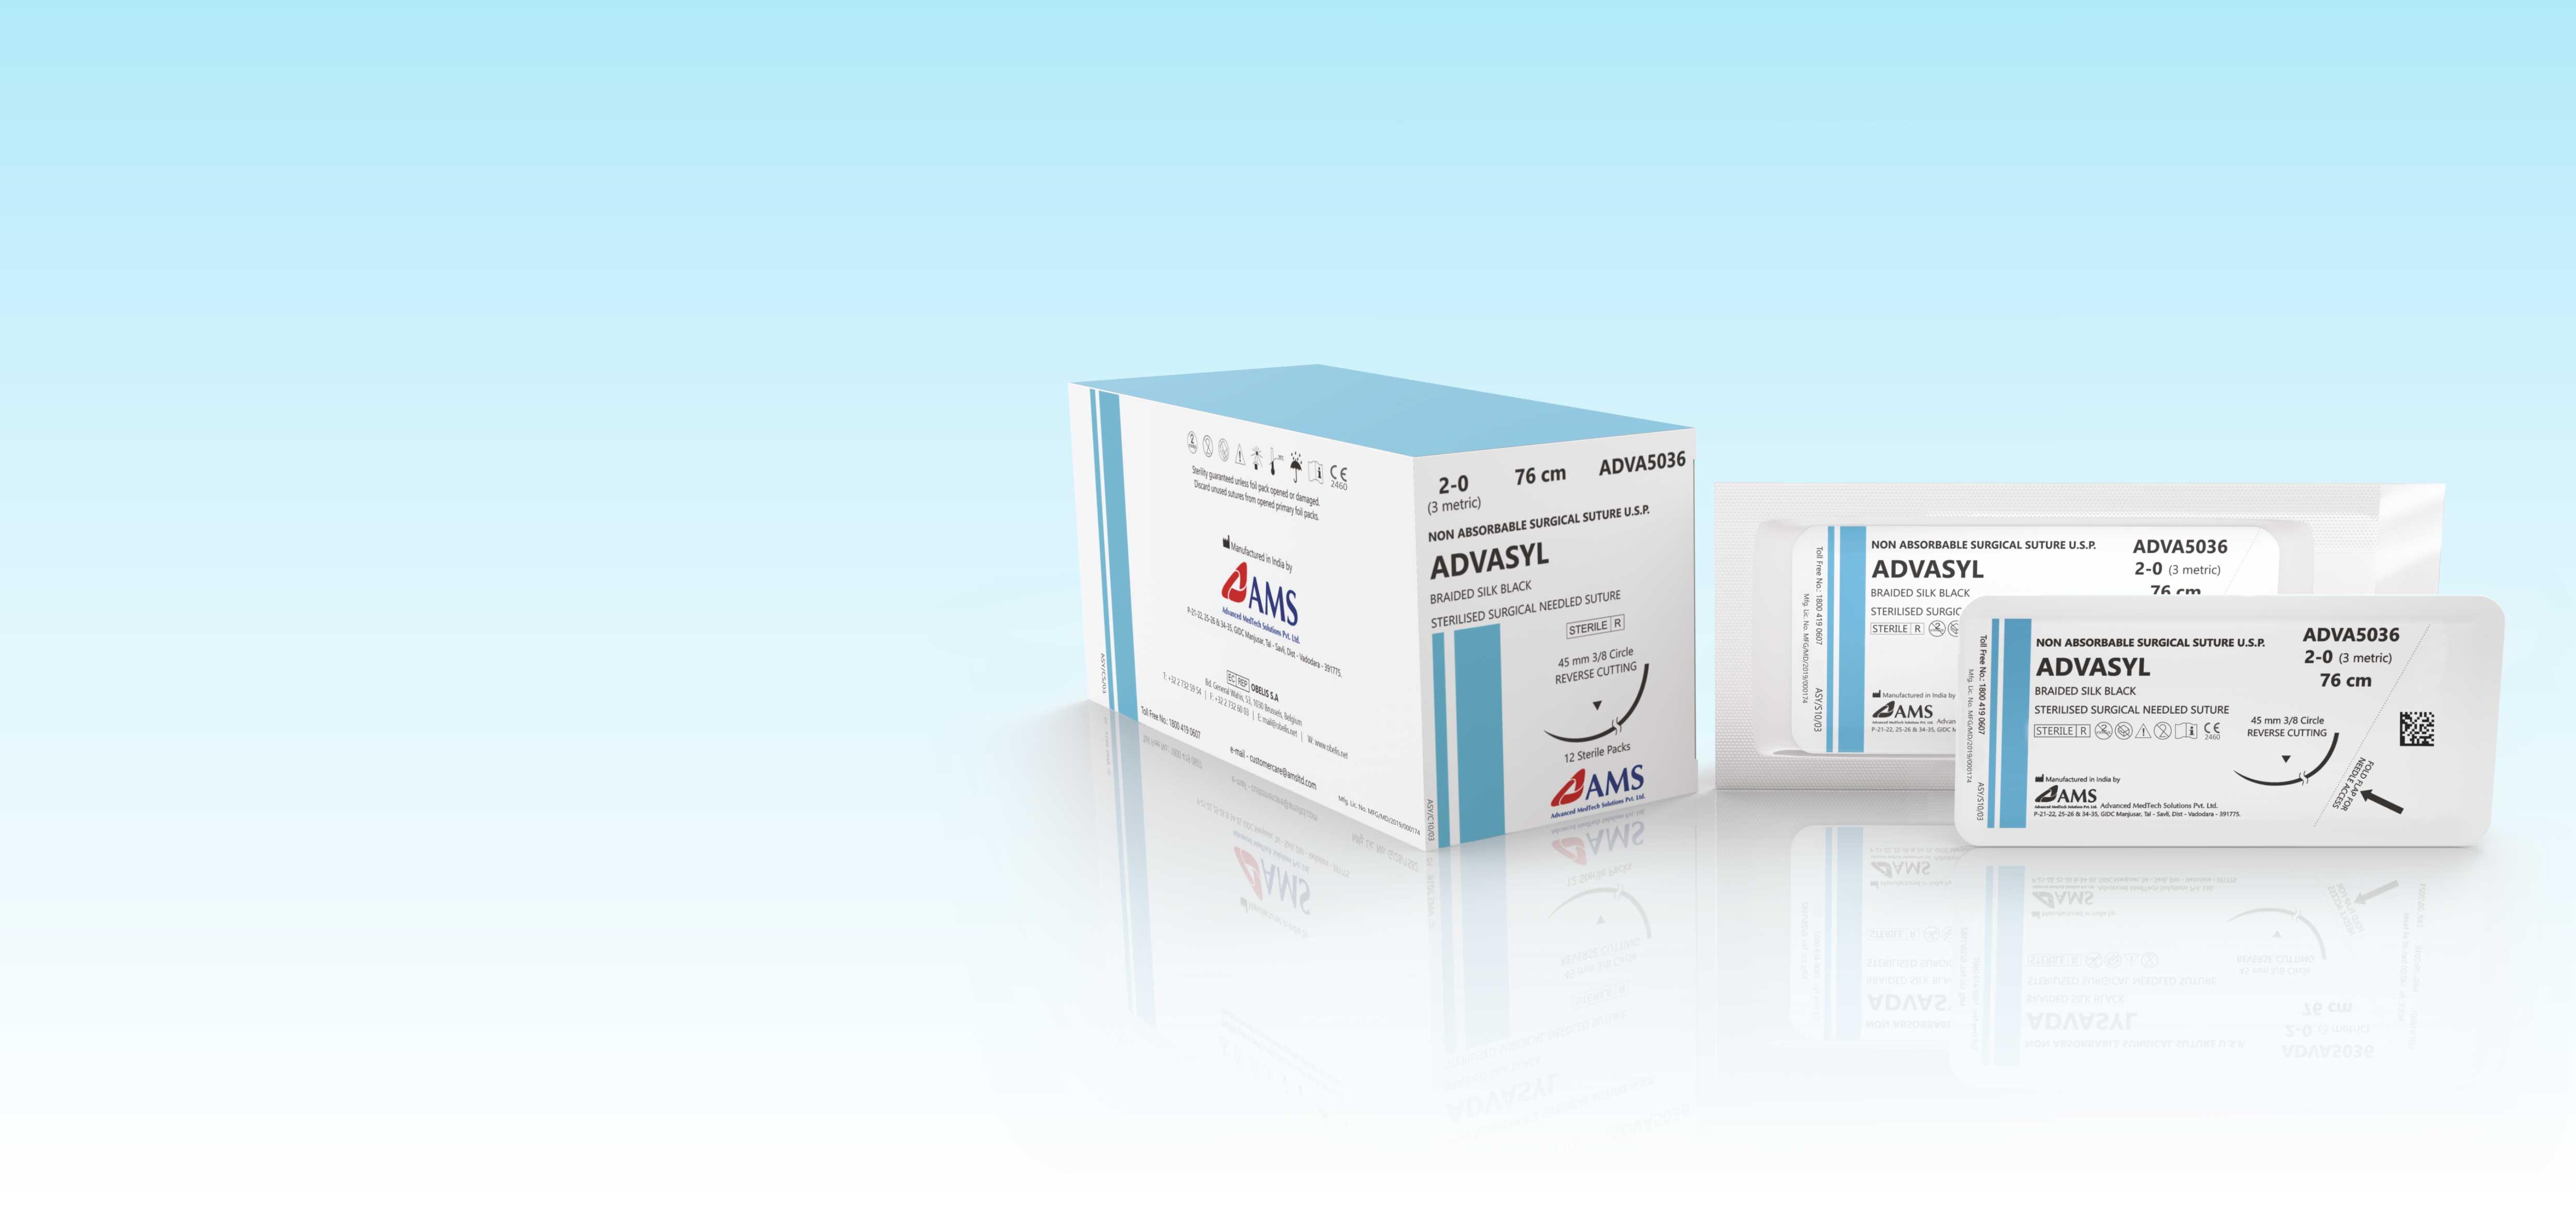 ADVASYL <span>Proteinaceous silk fibres called fibroin </span><small>Braided Natural Non-Absorbable Surgical Suture</small>